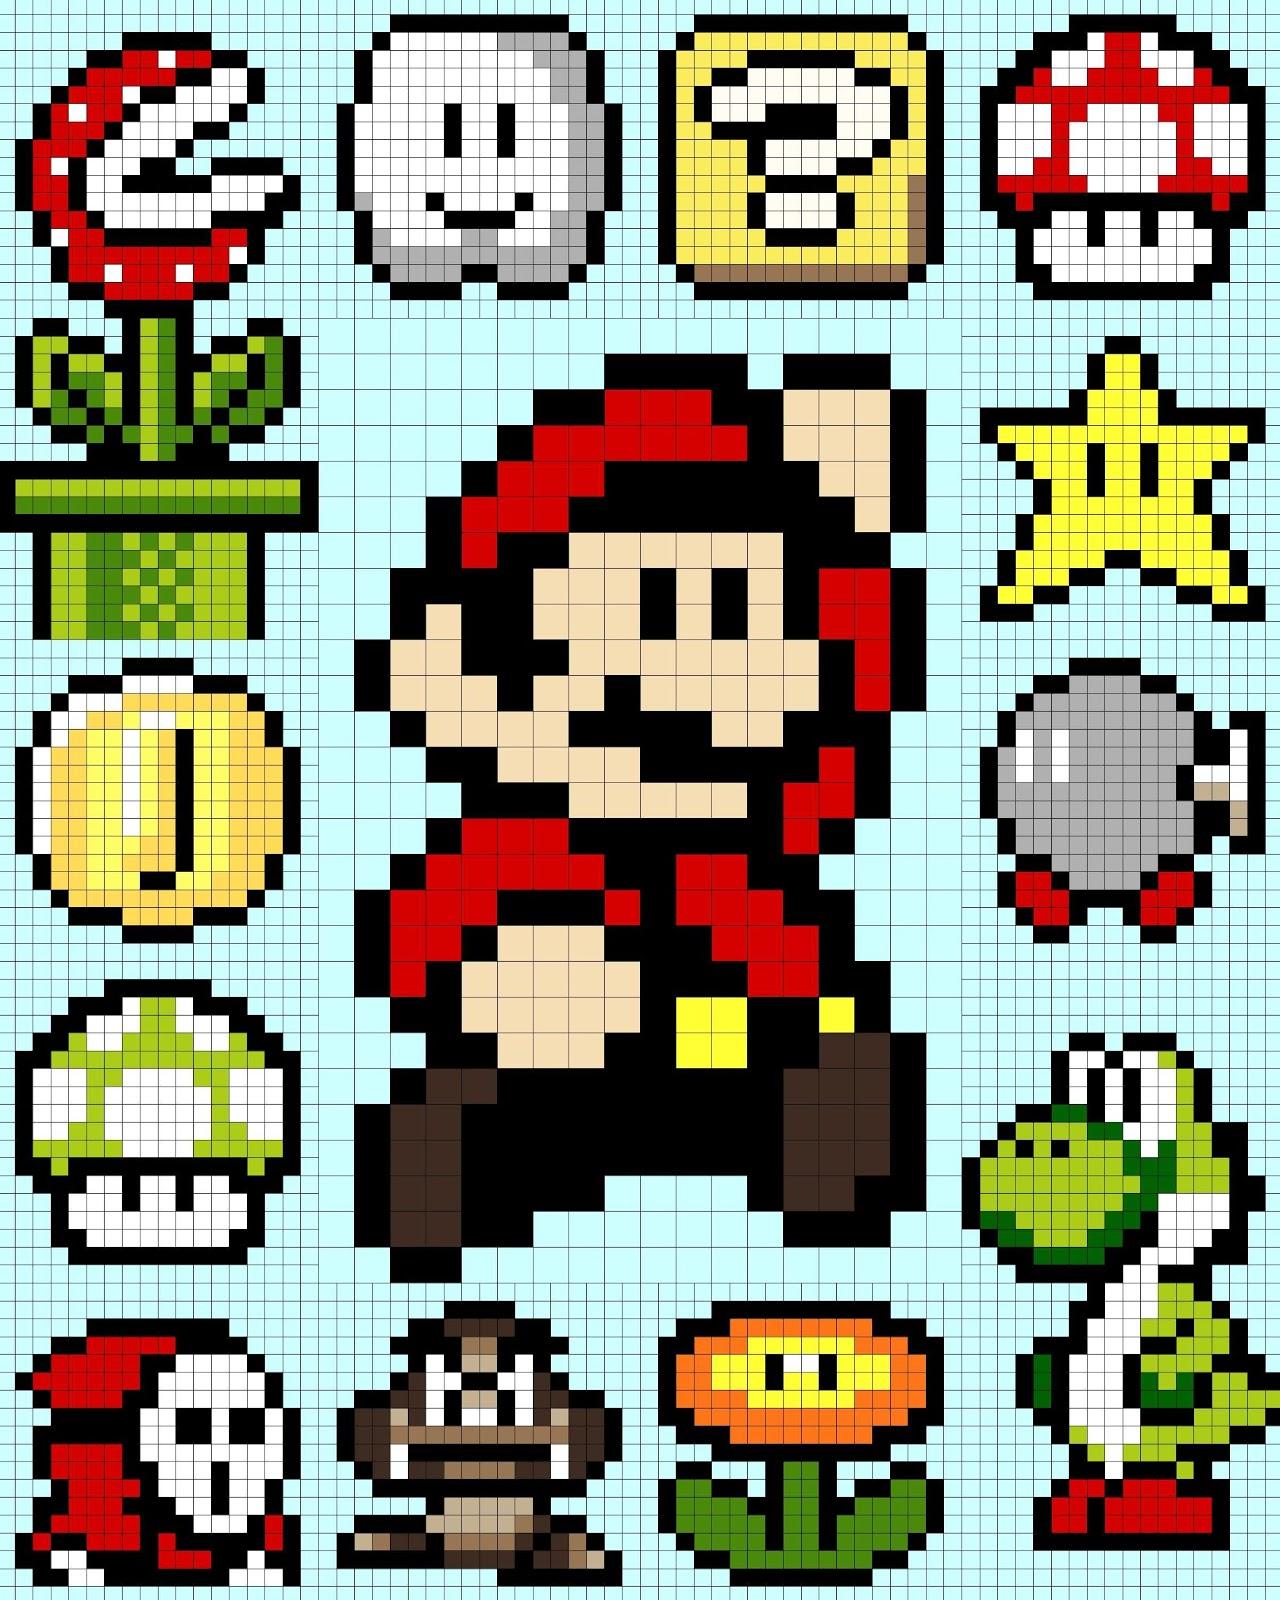 Mario 16 Bit Grid | www.imgkid.com - The Image Kid Has It!